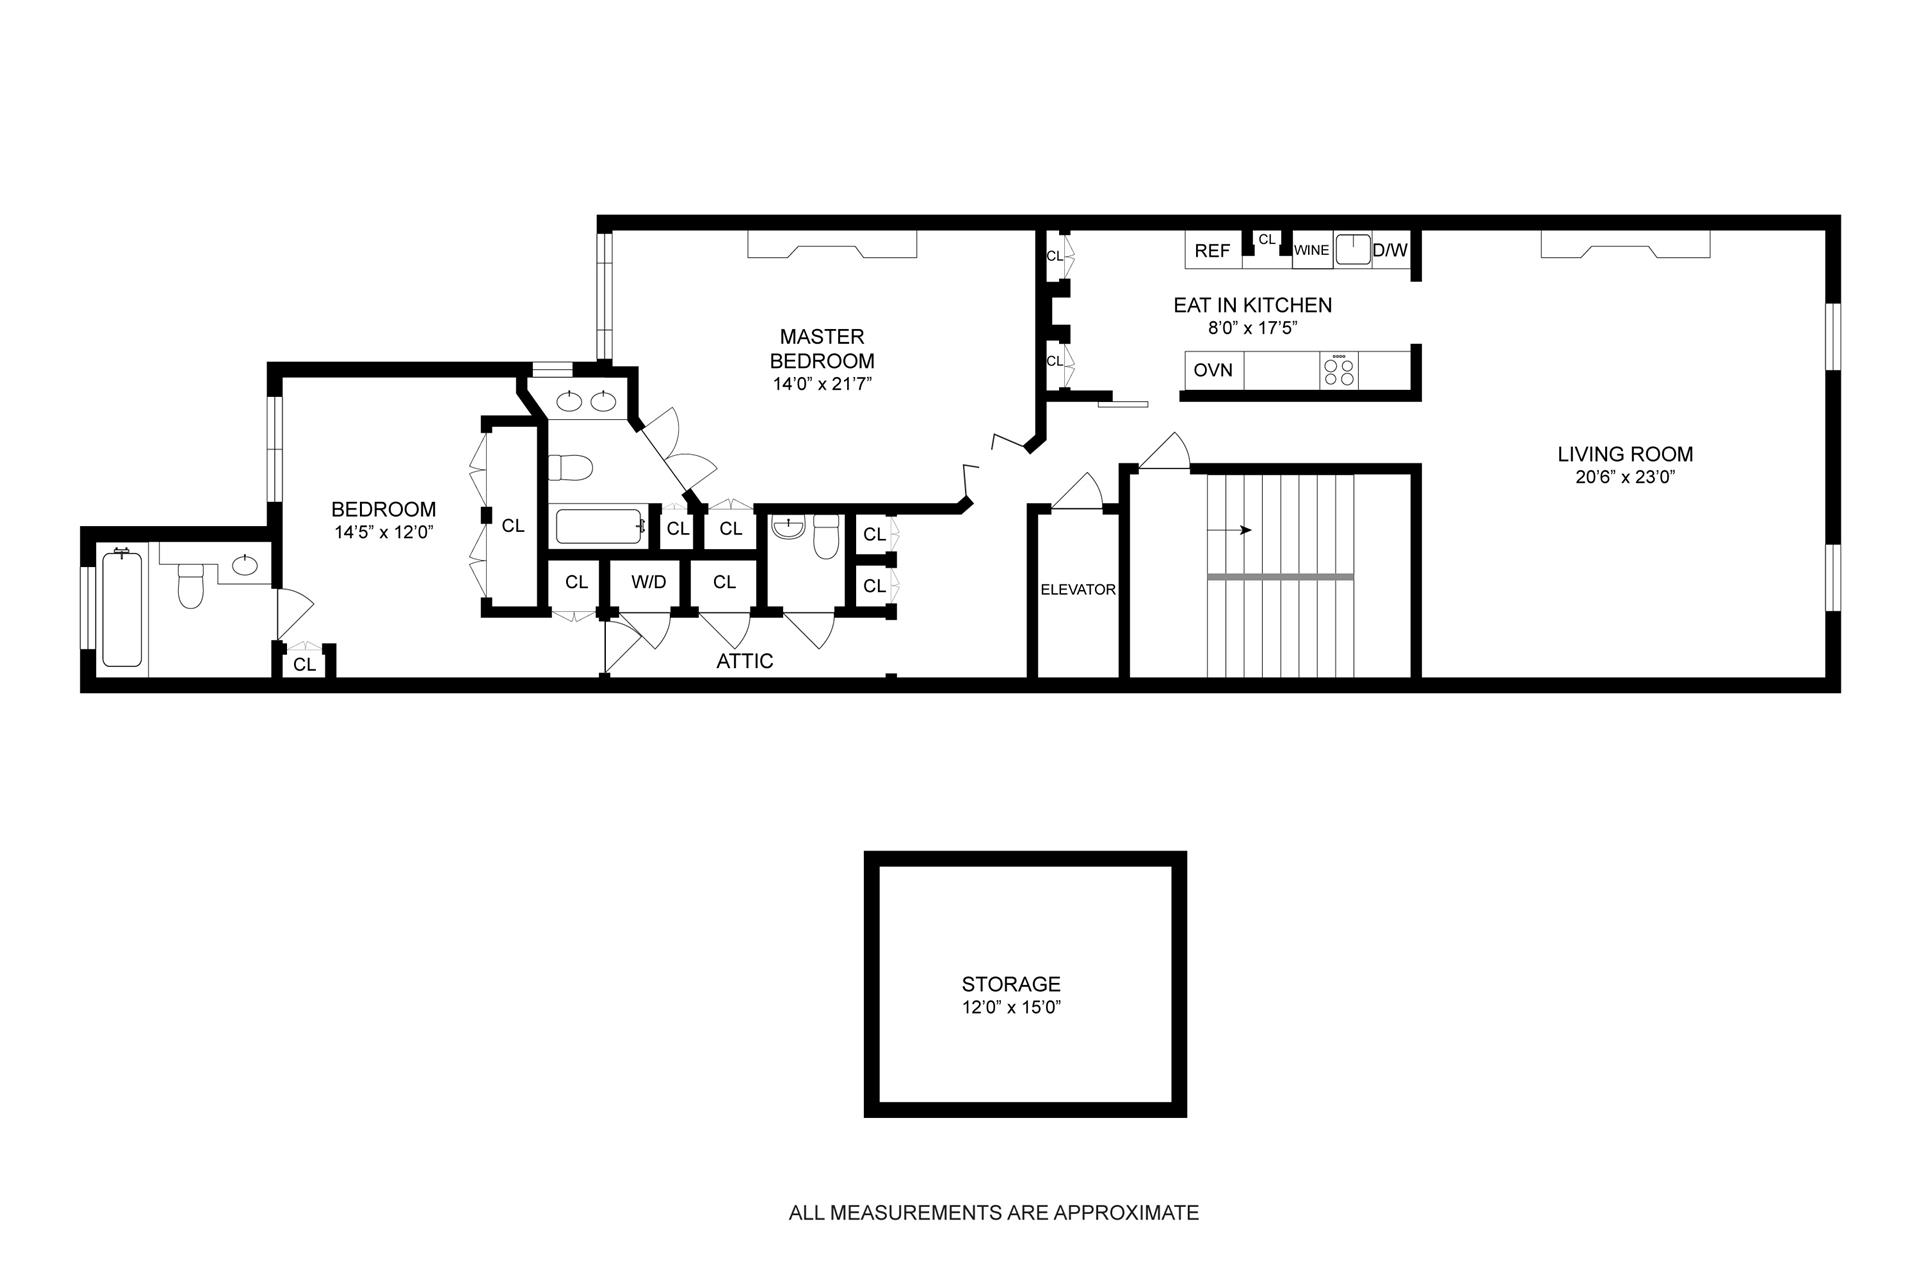 Floor plan of 48 West 86th St, 2 - Upper West Side, New York